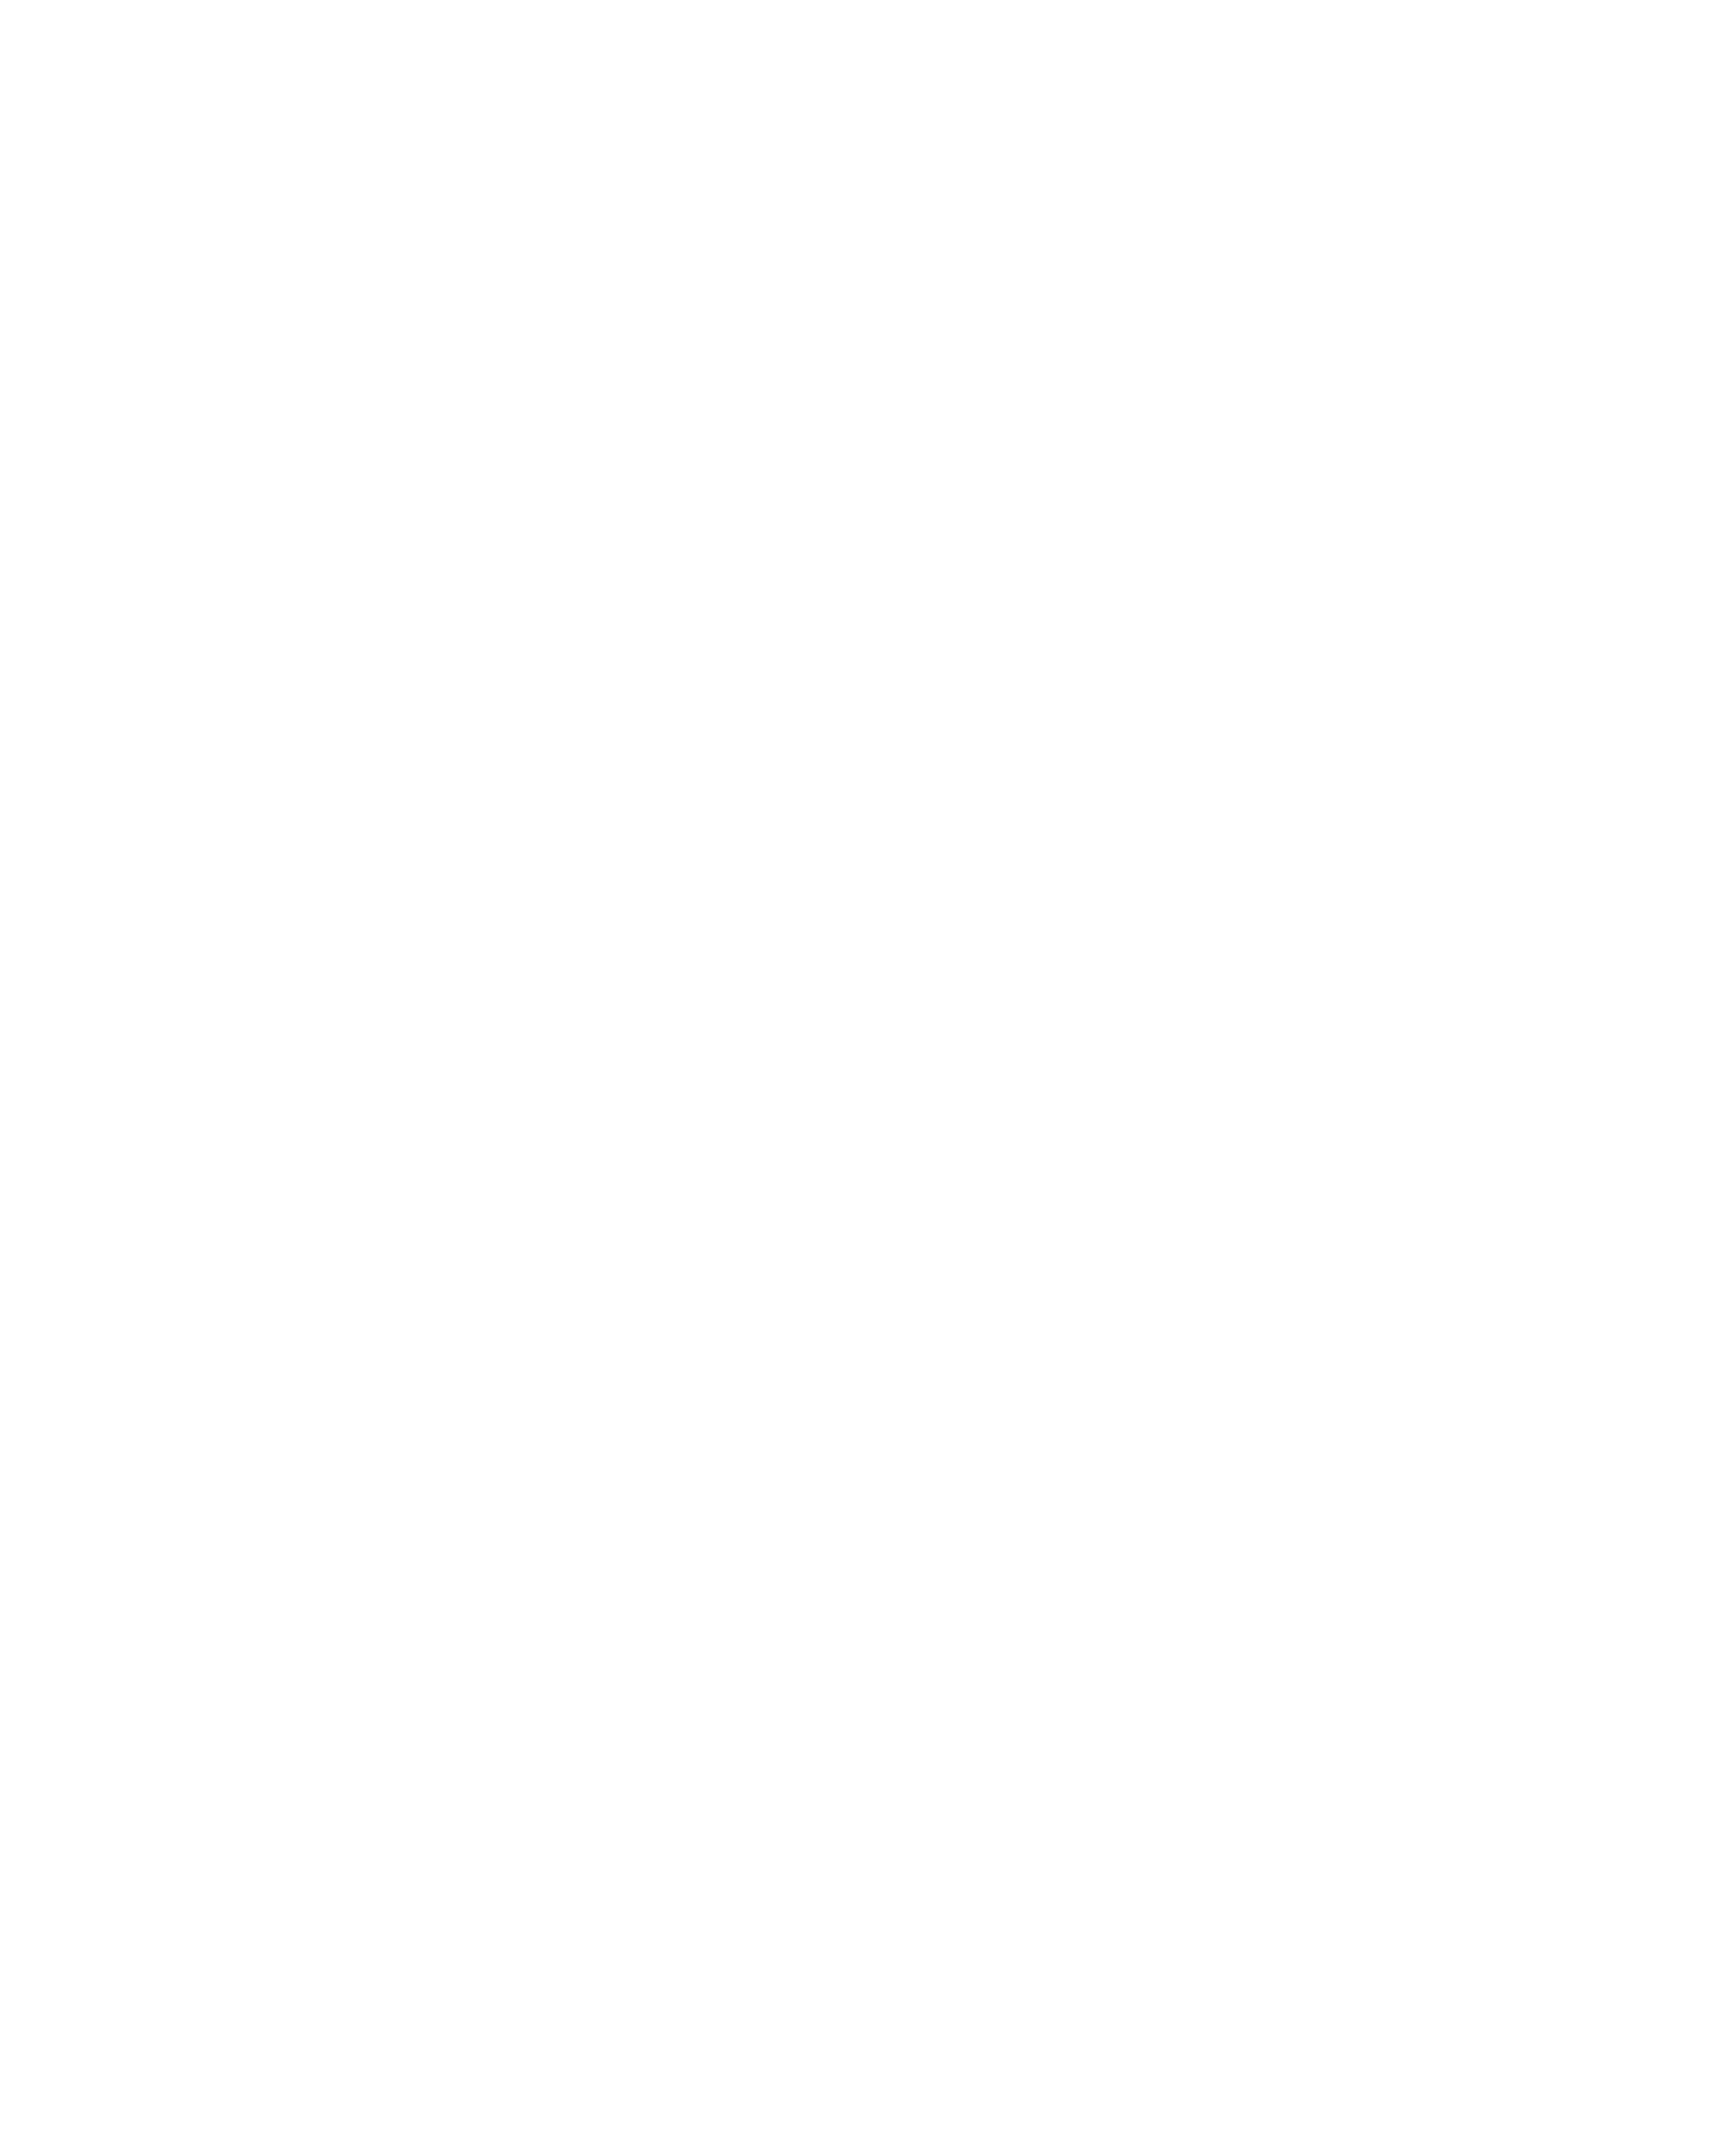 cc_white.png